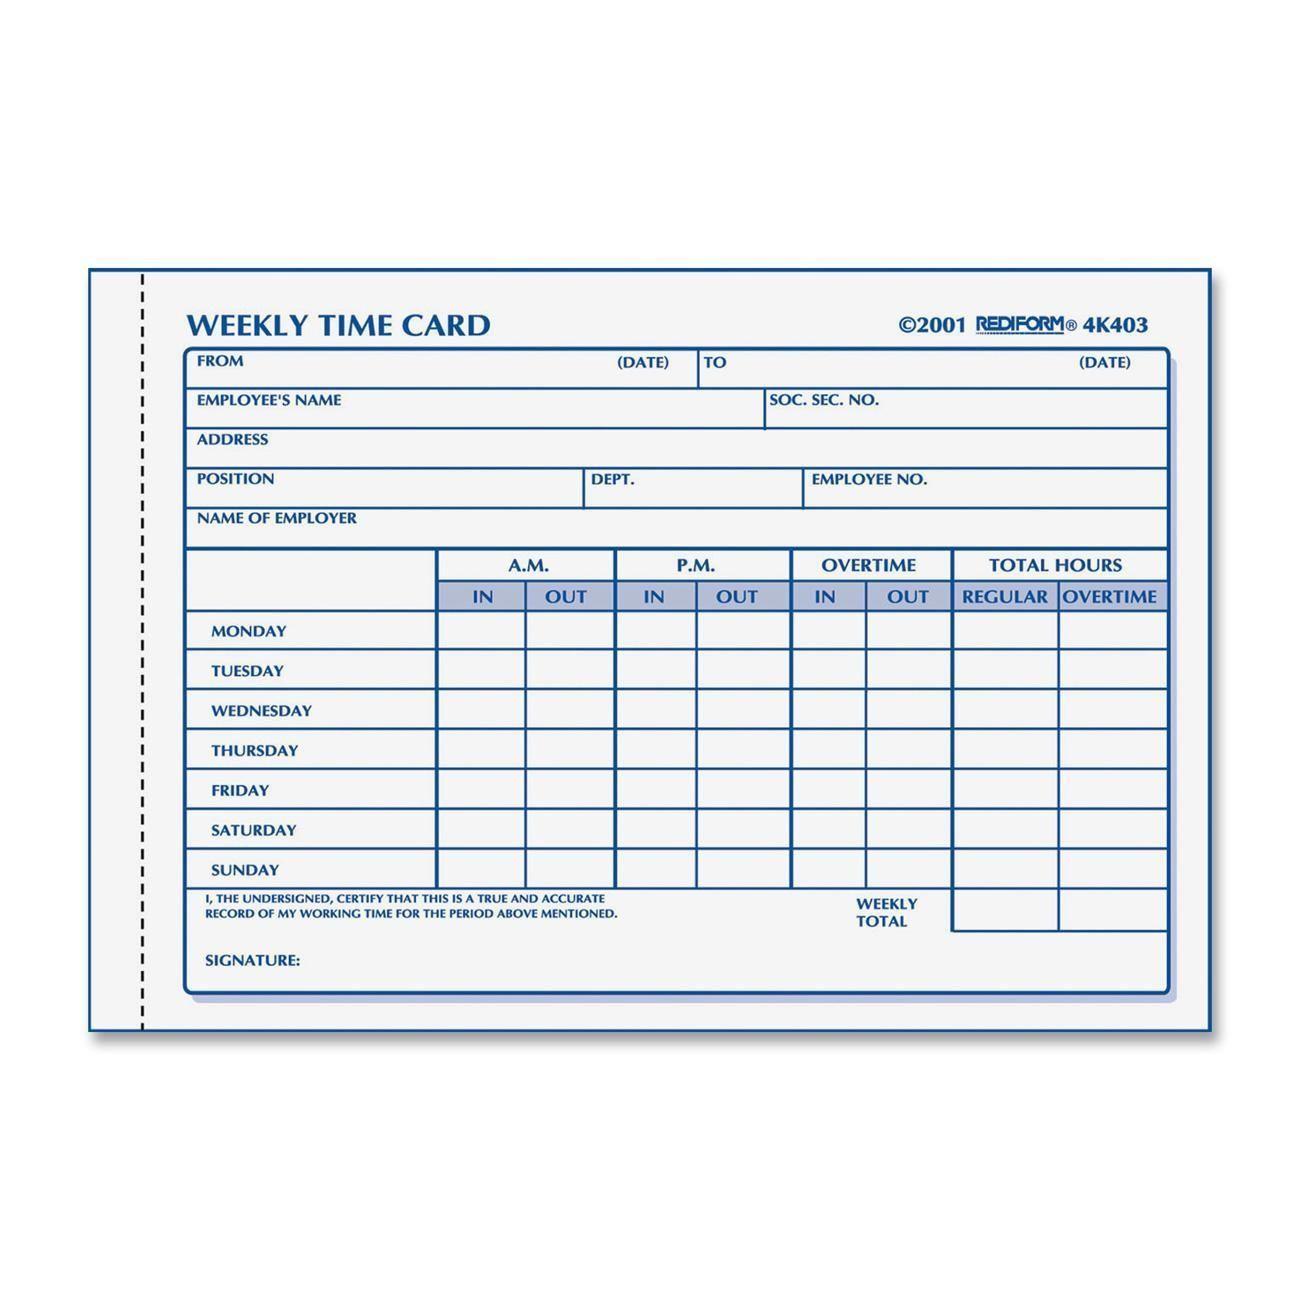 000 Astounding Employee Time Card Form Inspiration  Timesheet Template Excel Sheet FreeFull